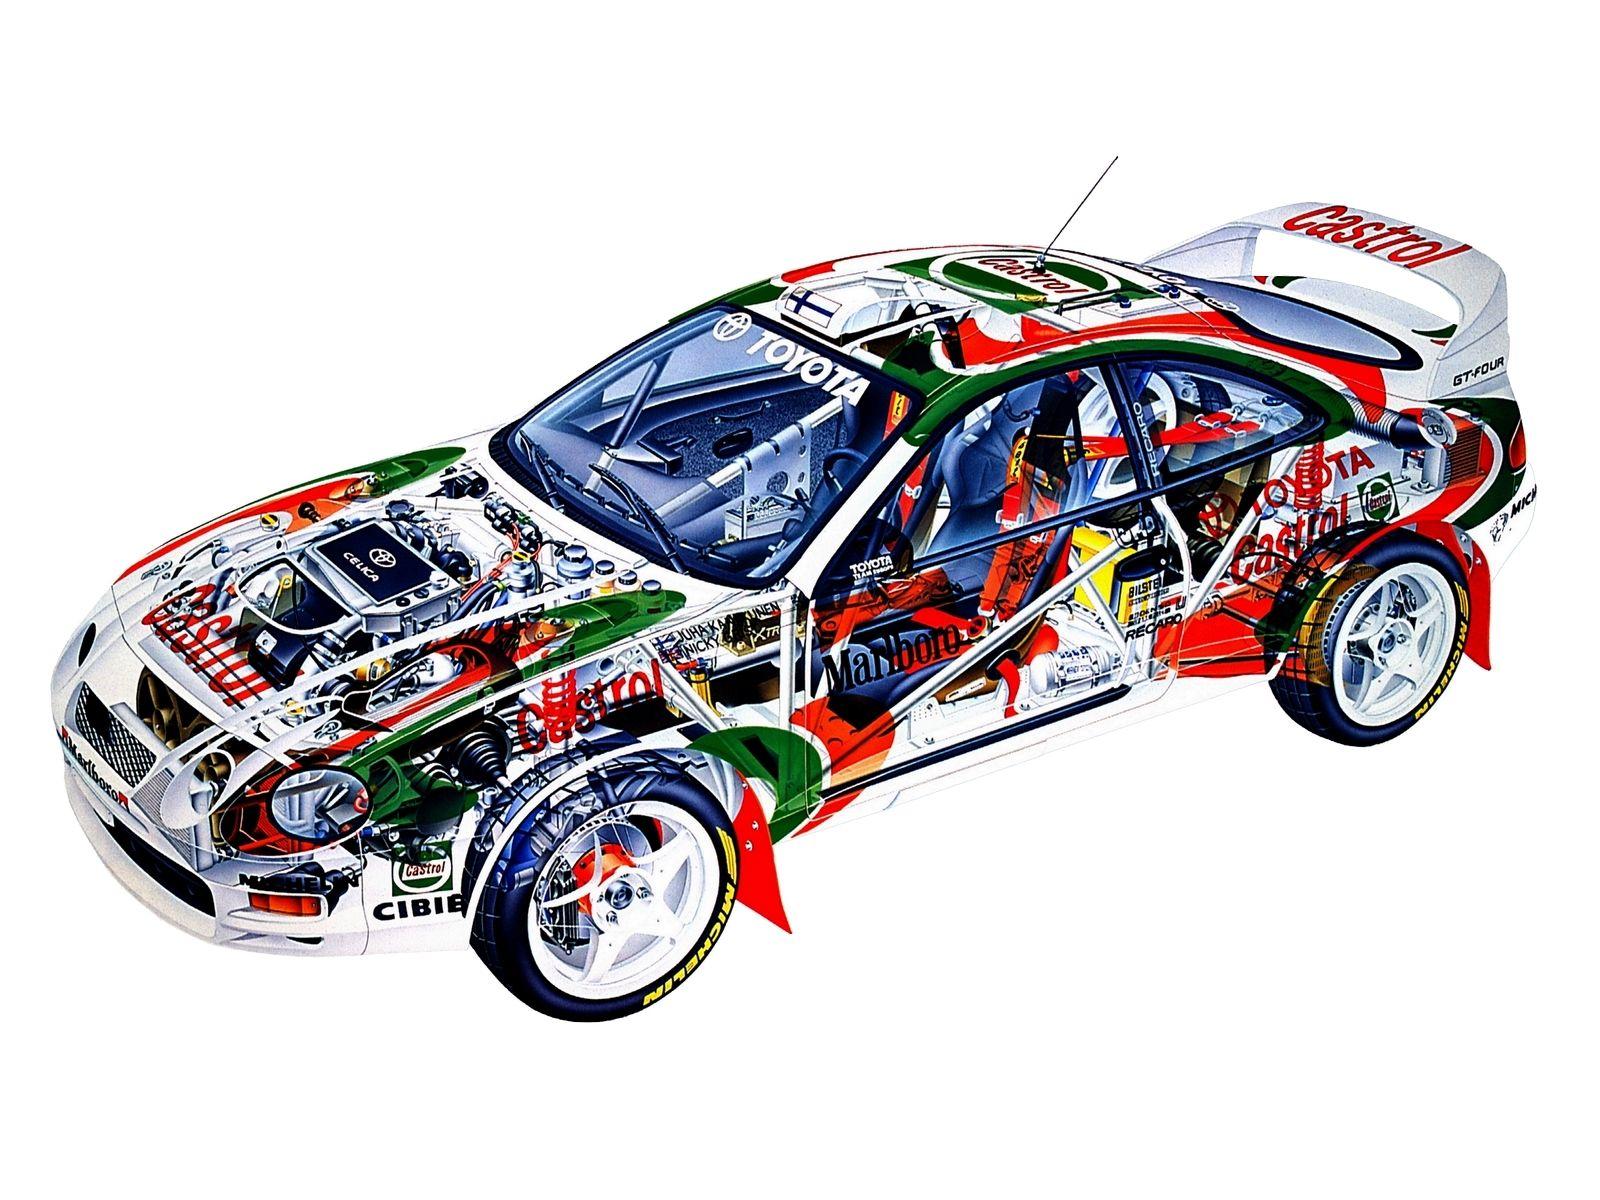 1994-1999 Toyota Celica WRC - Illustration attributed to Antonio ...